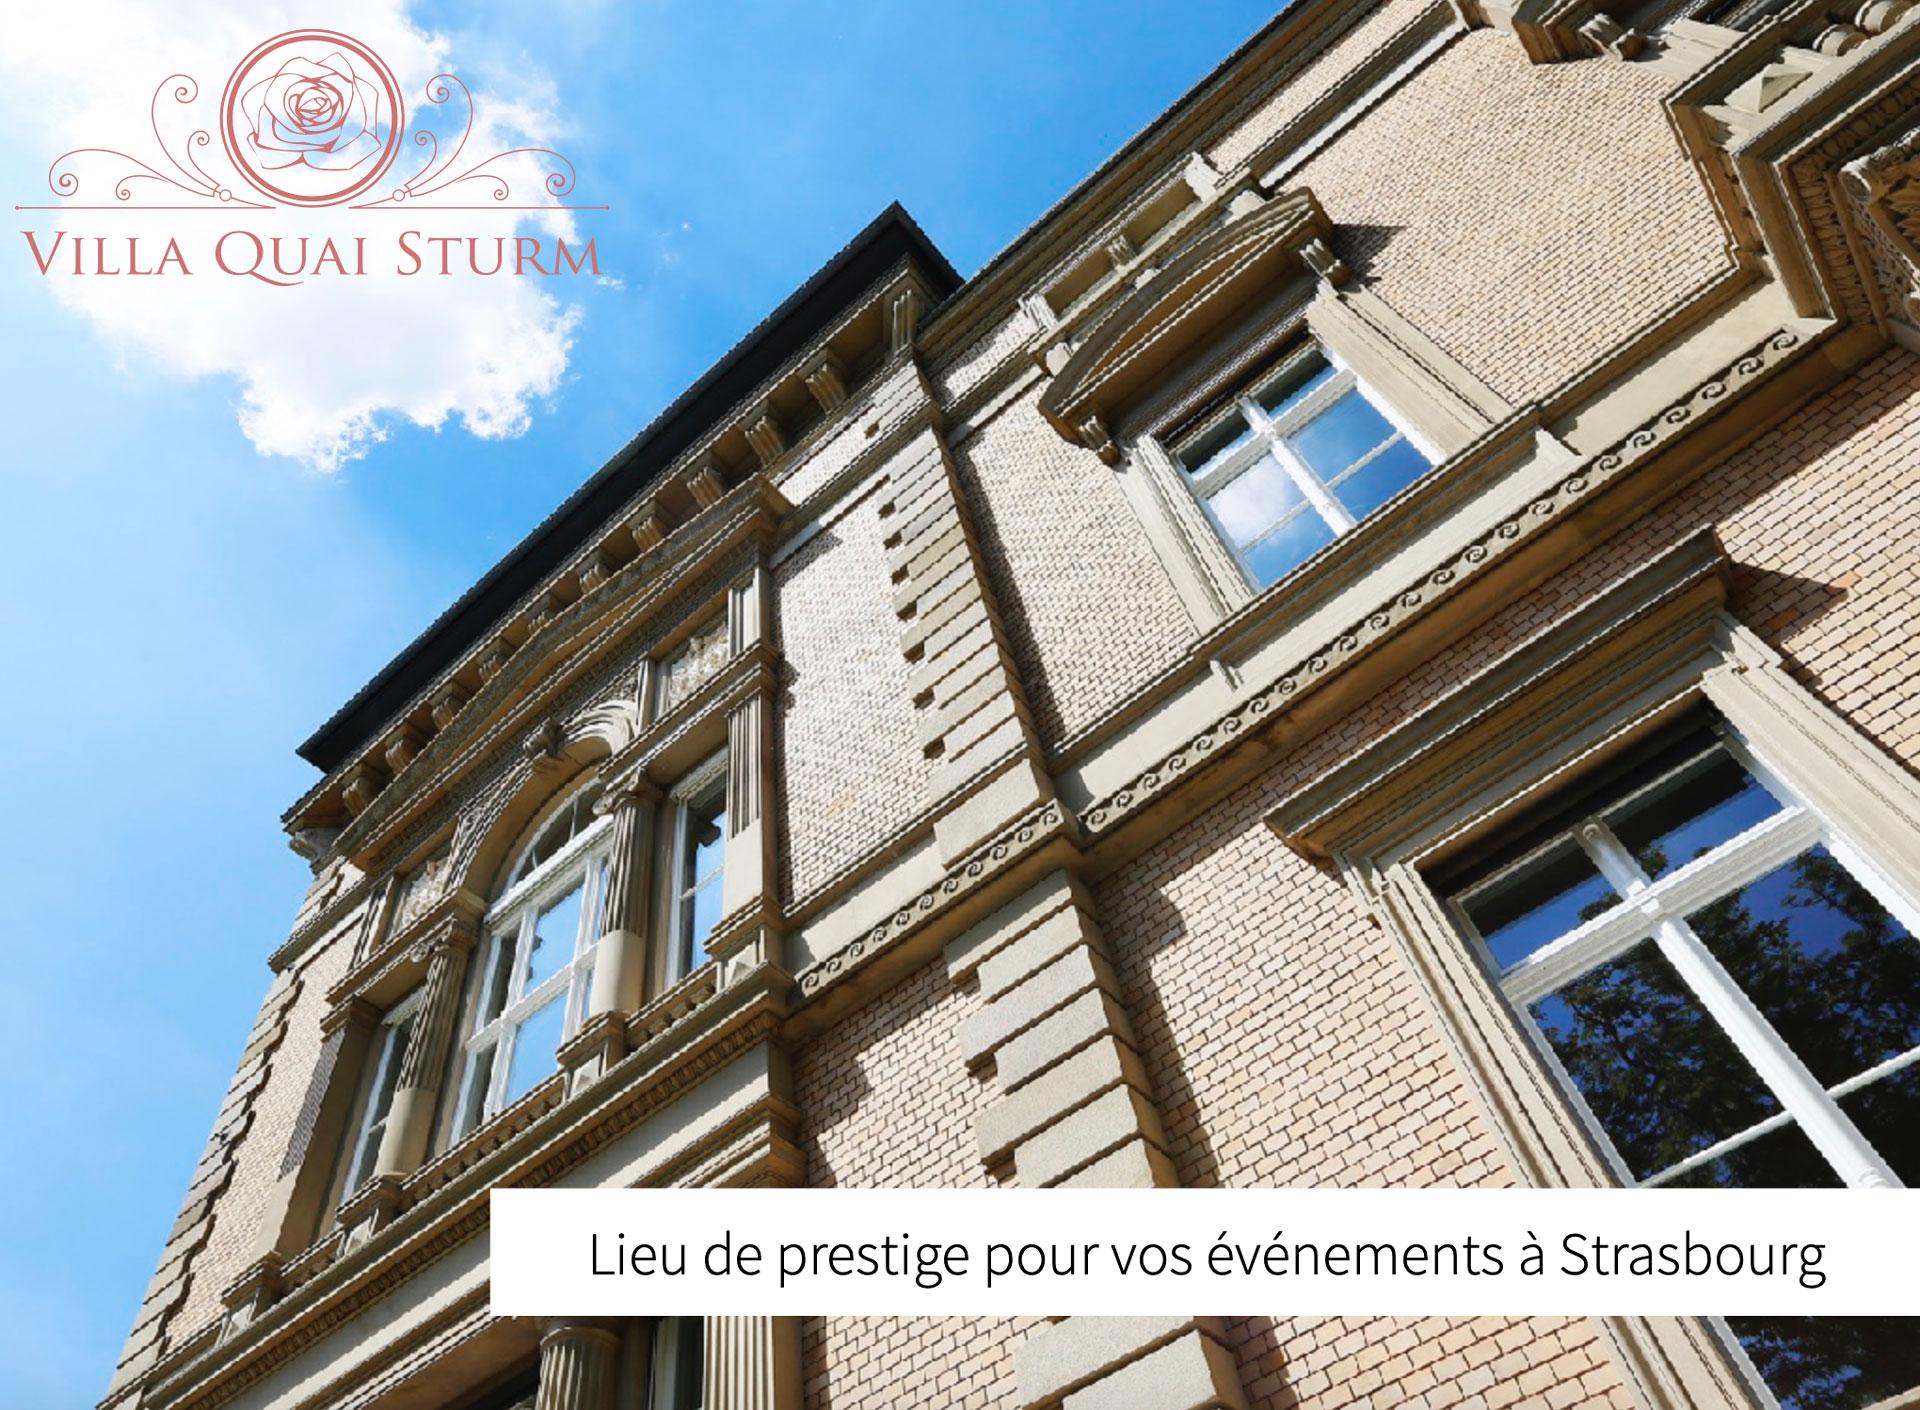 Villa Quai Sturm Strasbourg évènements